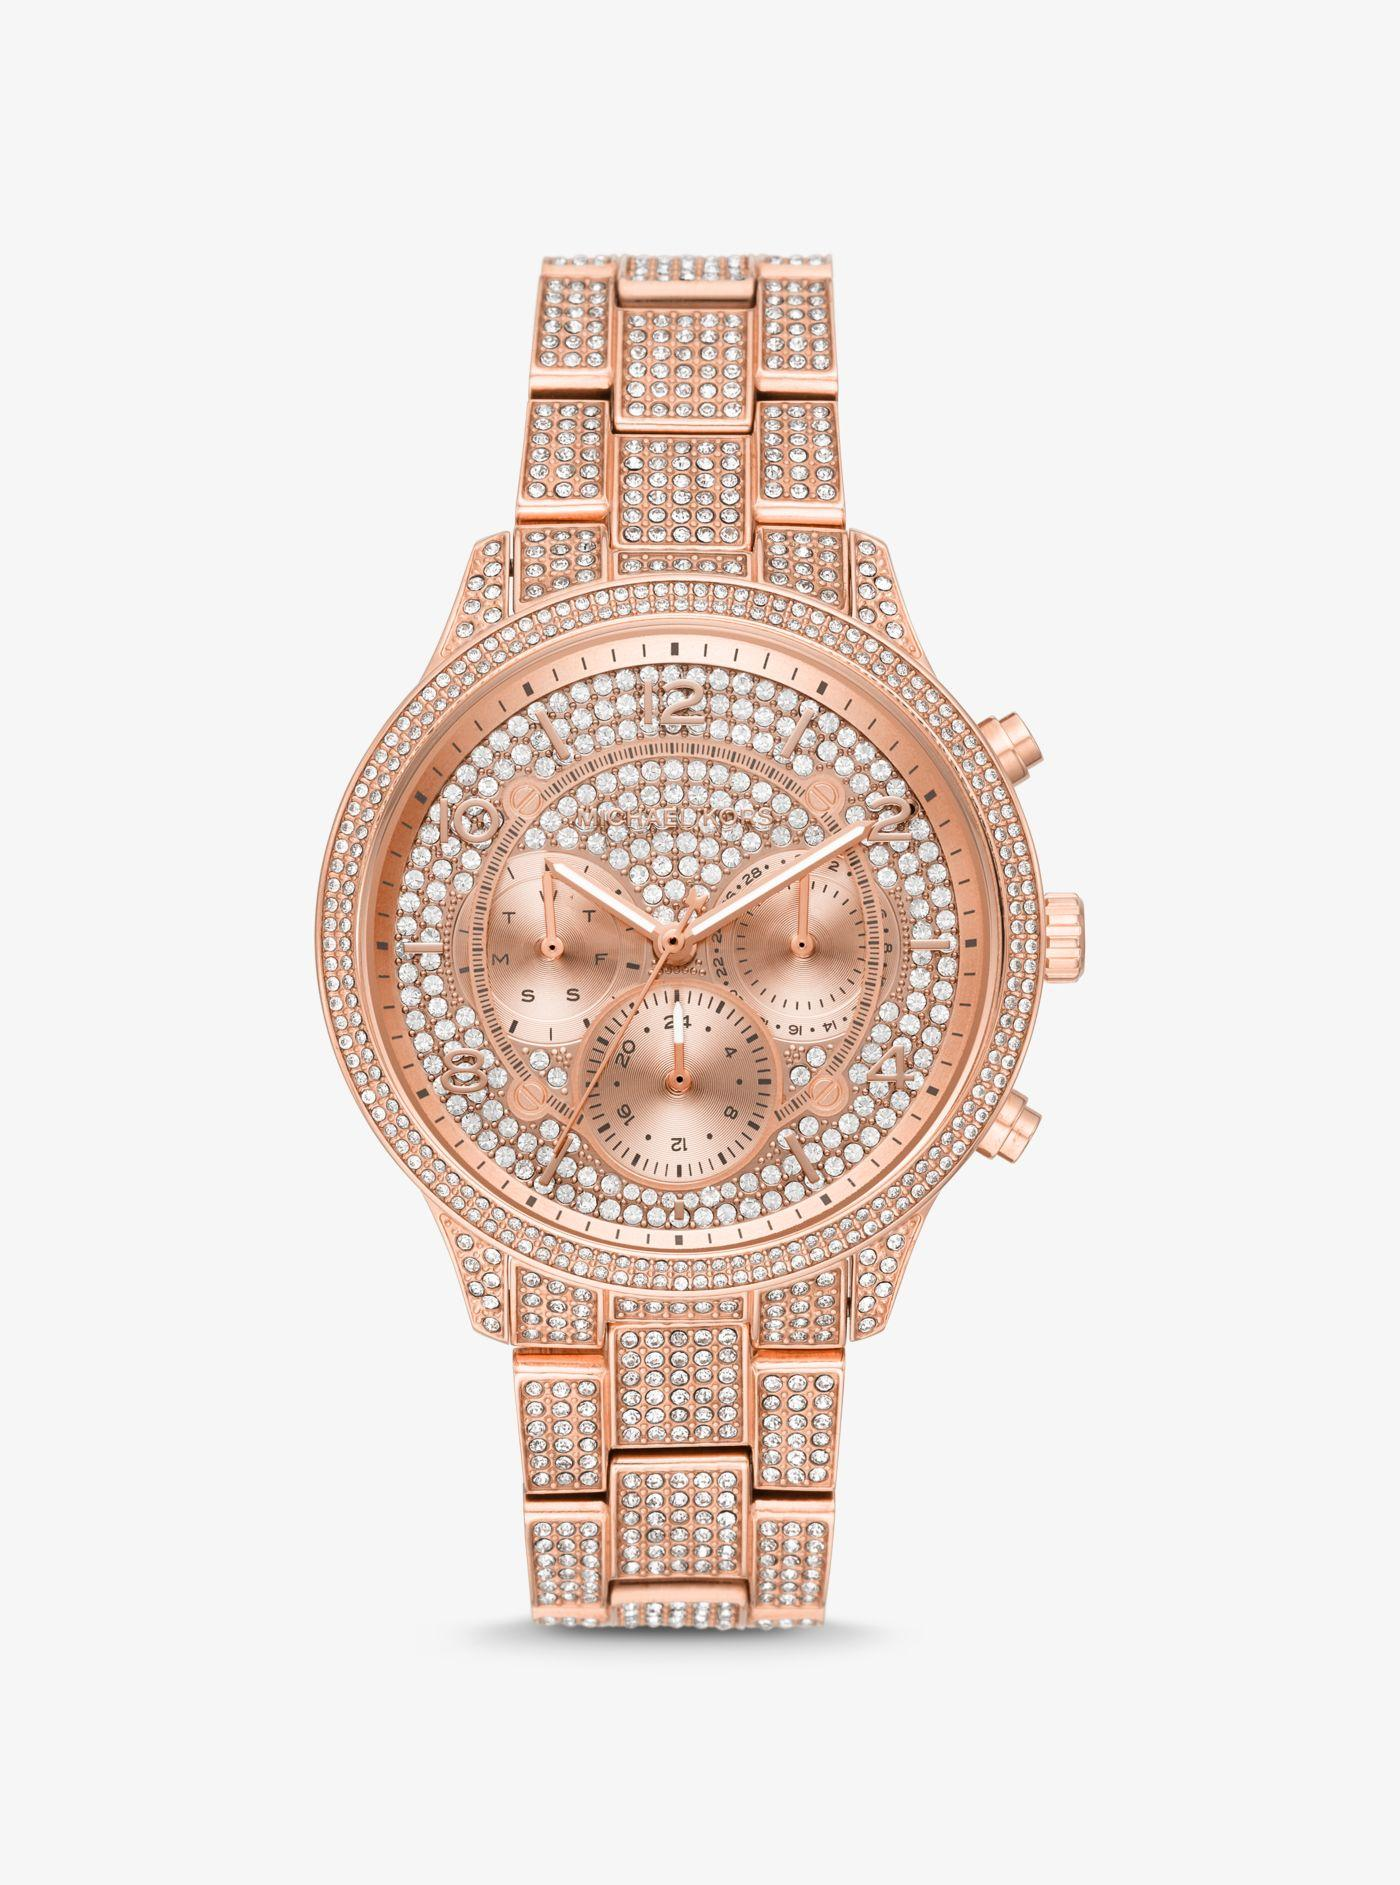 0b49be24a7c2 Lyst - Michael Kors Runway Pavé Rose Gold-tone Watch in Metallic